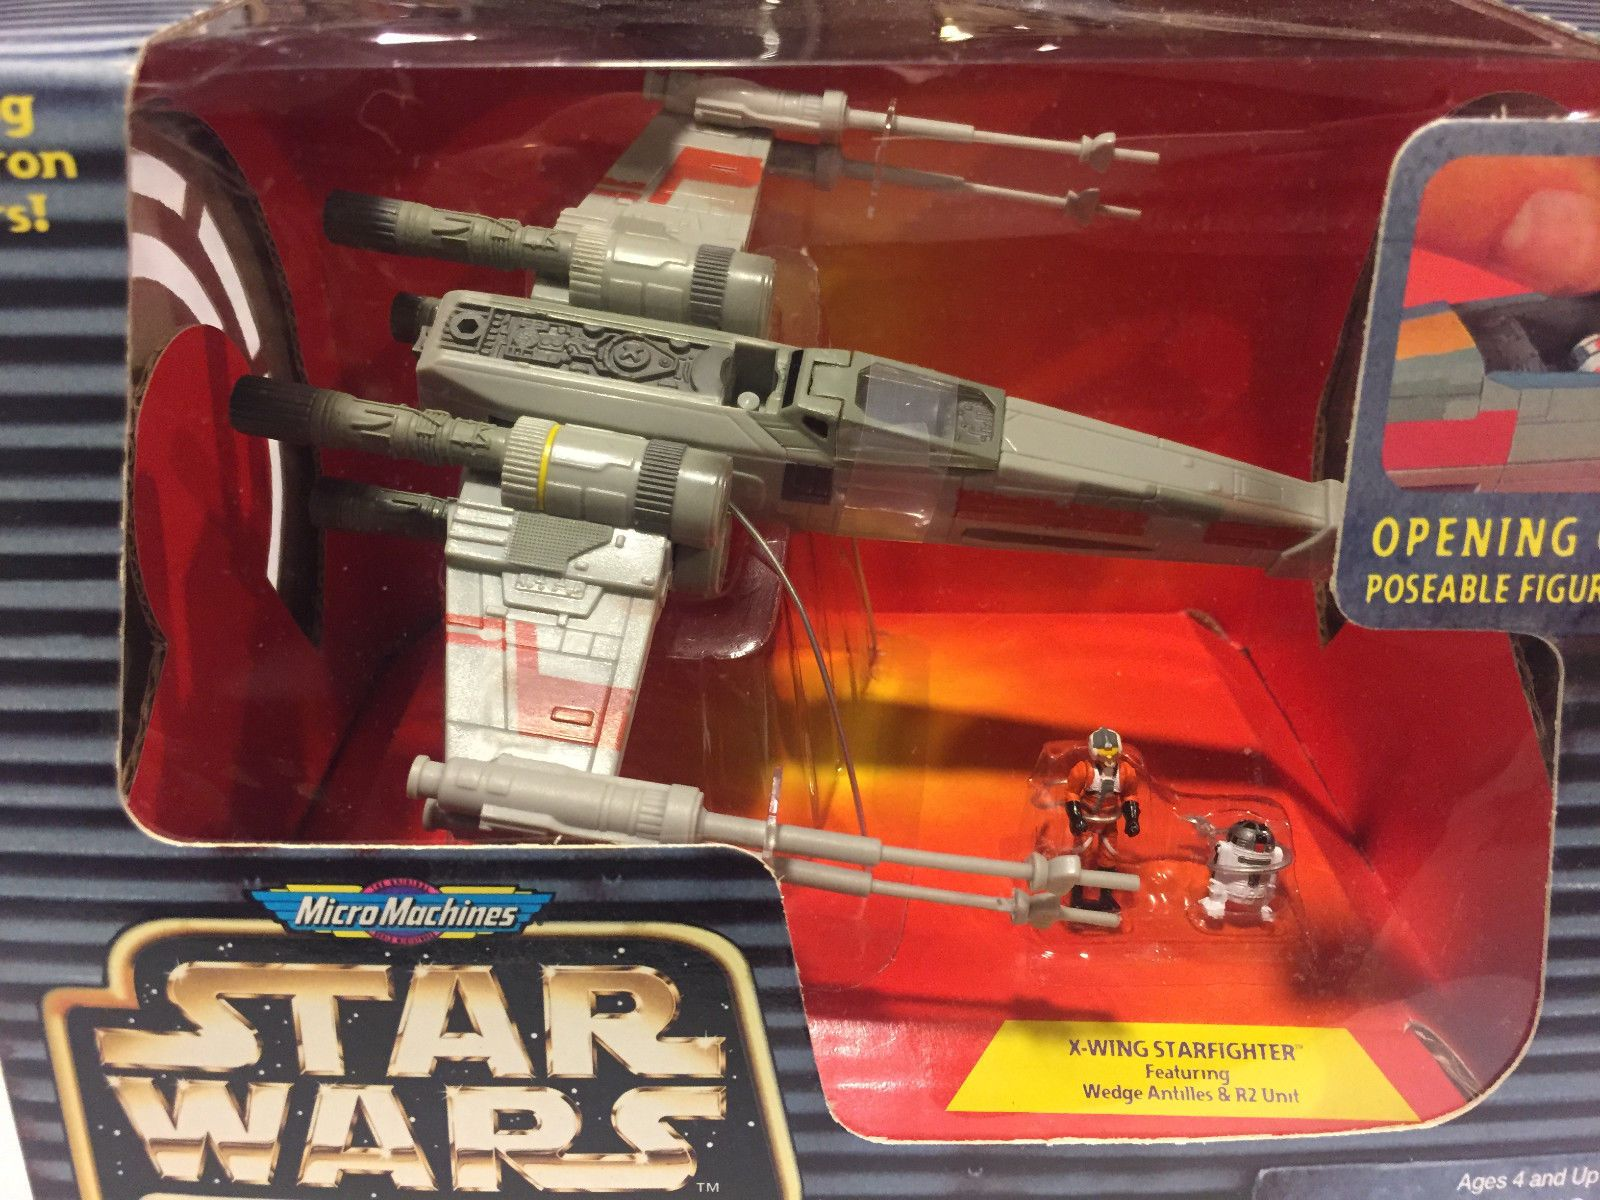 Micro Machines Star Wars Action Fleet Mon Mothma